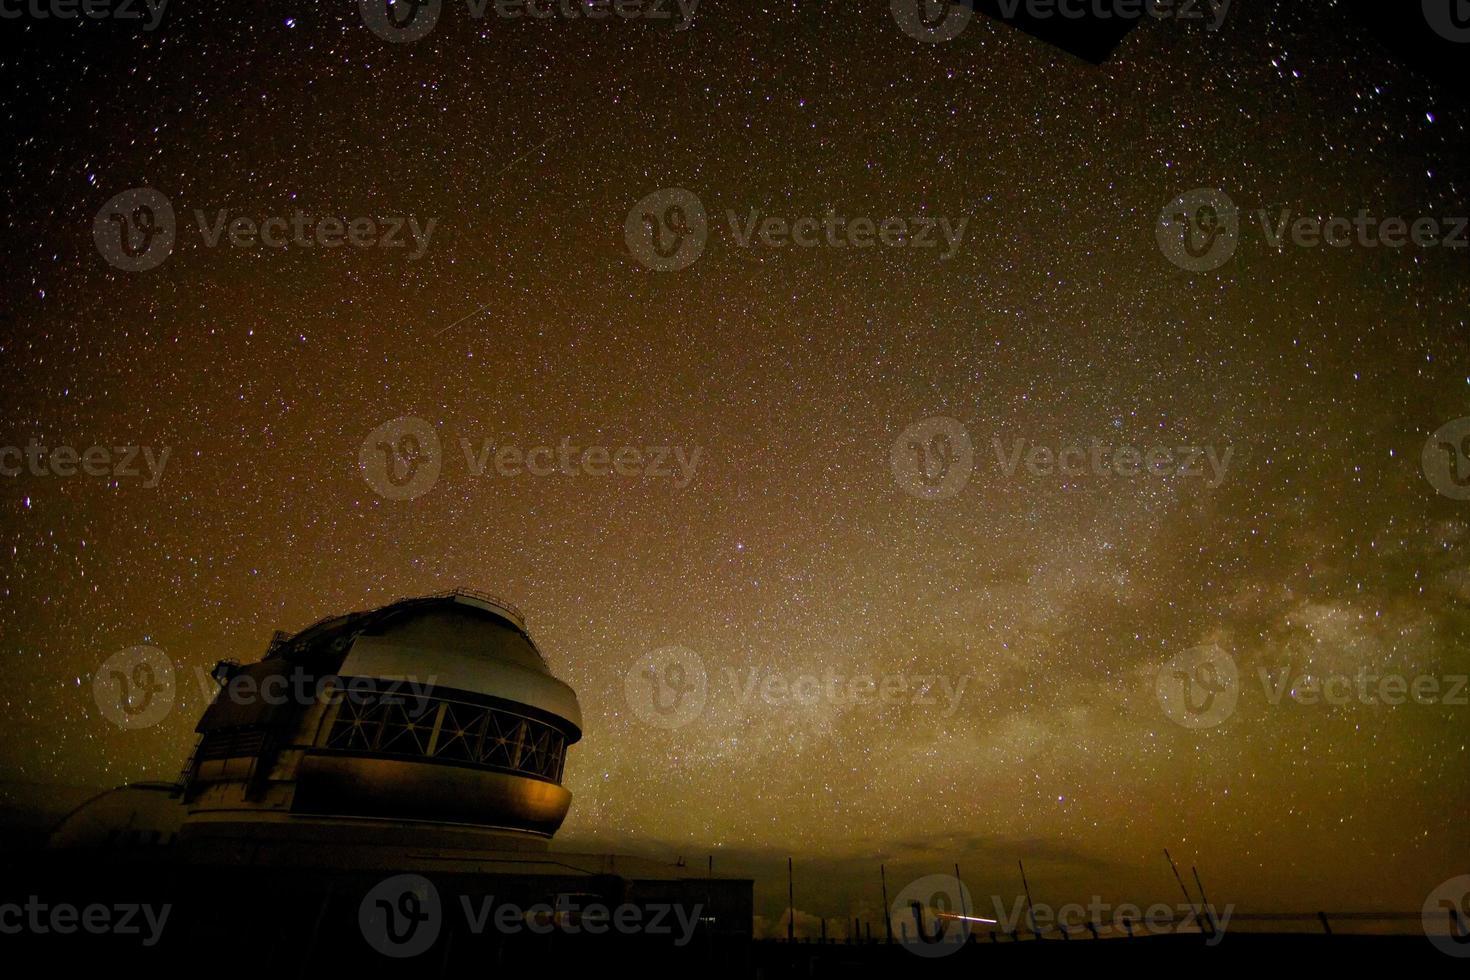 nave espacial e a Via Láctea foto